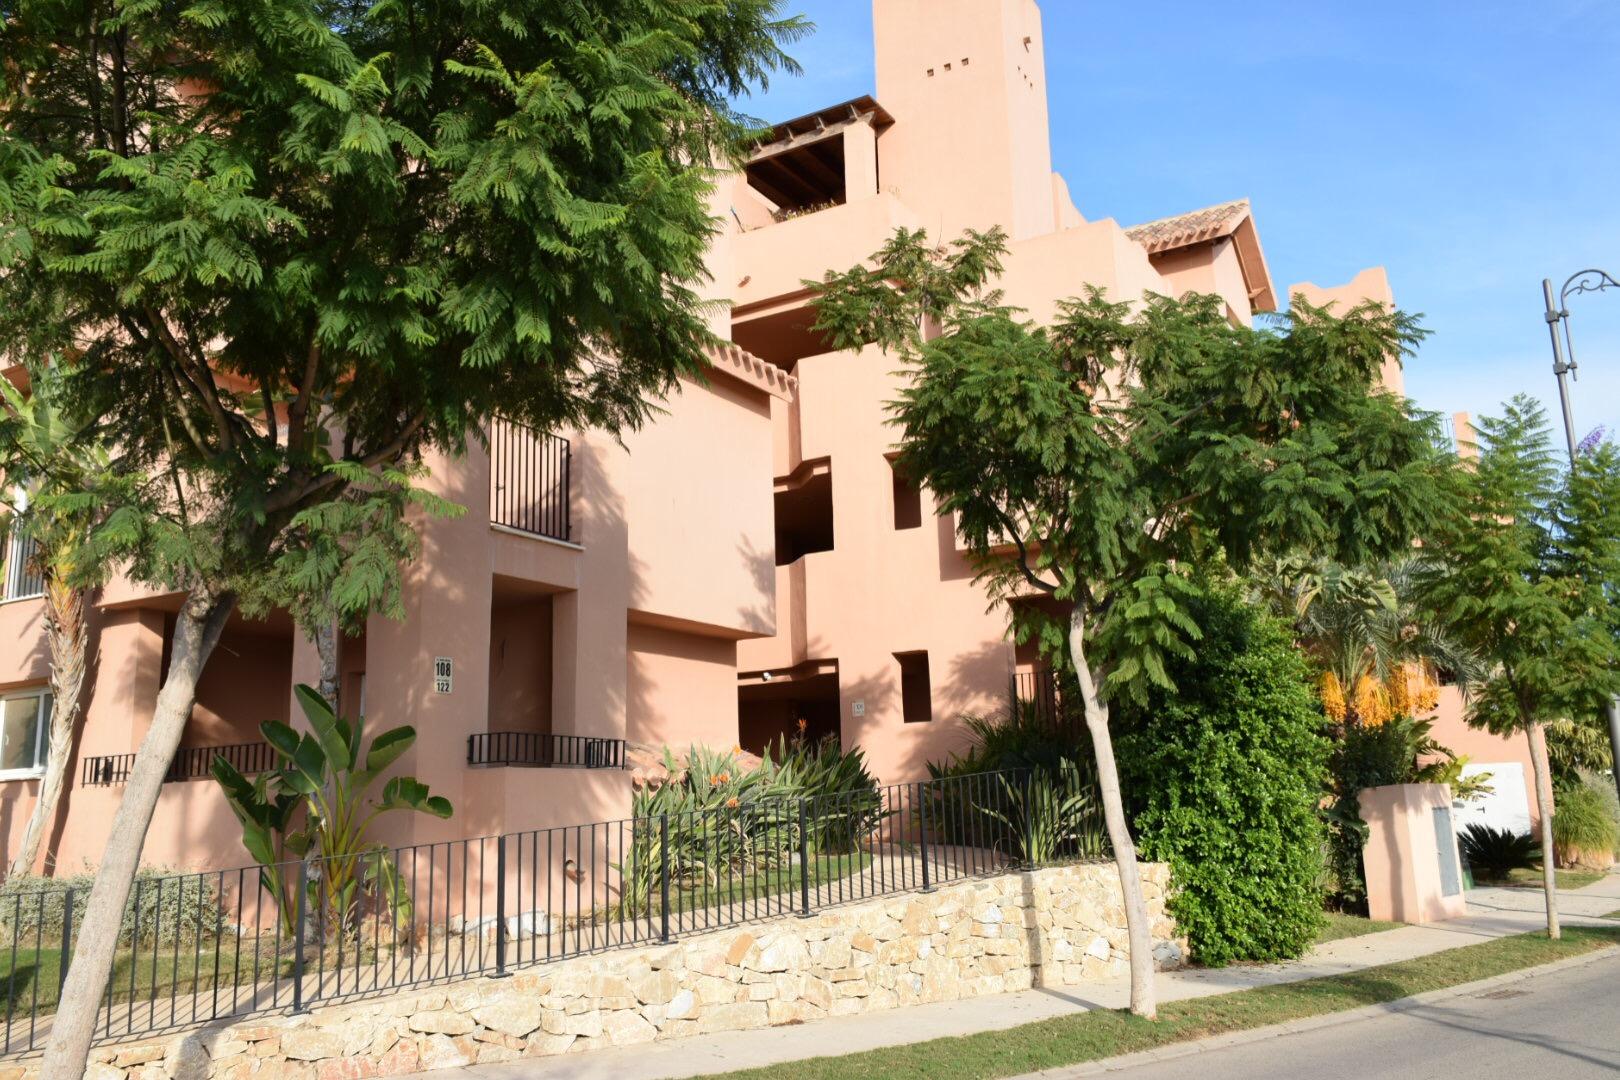 Apartment for Long Term Rent Mar Menor Golf Resort